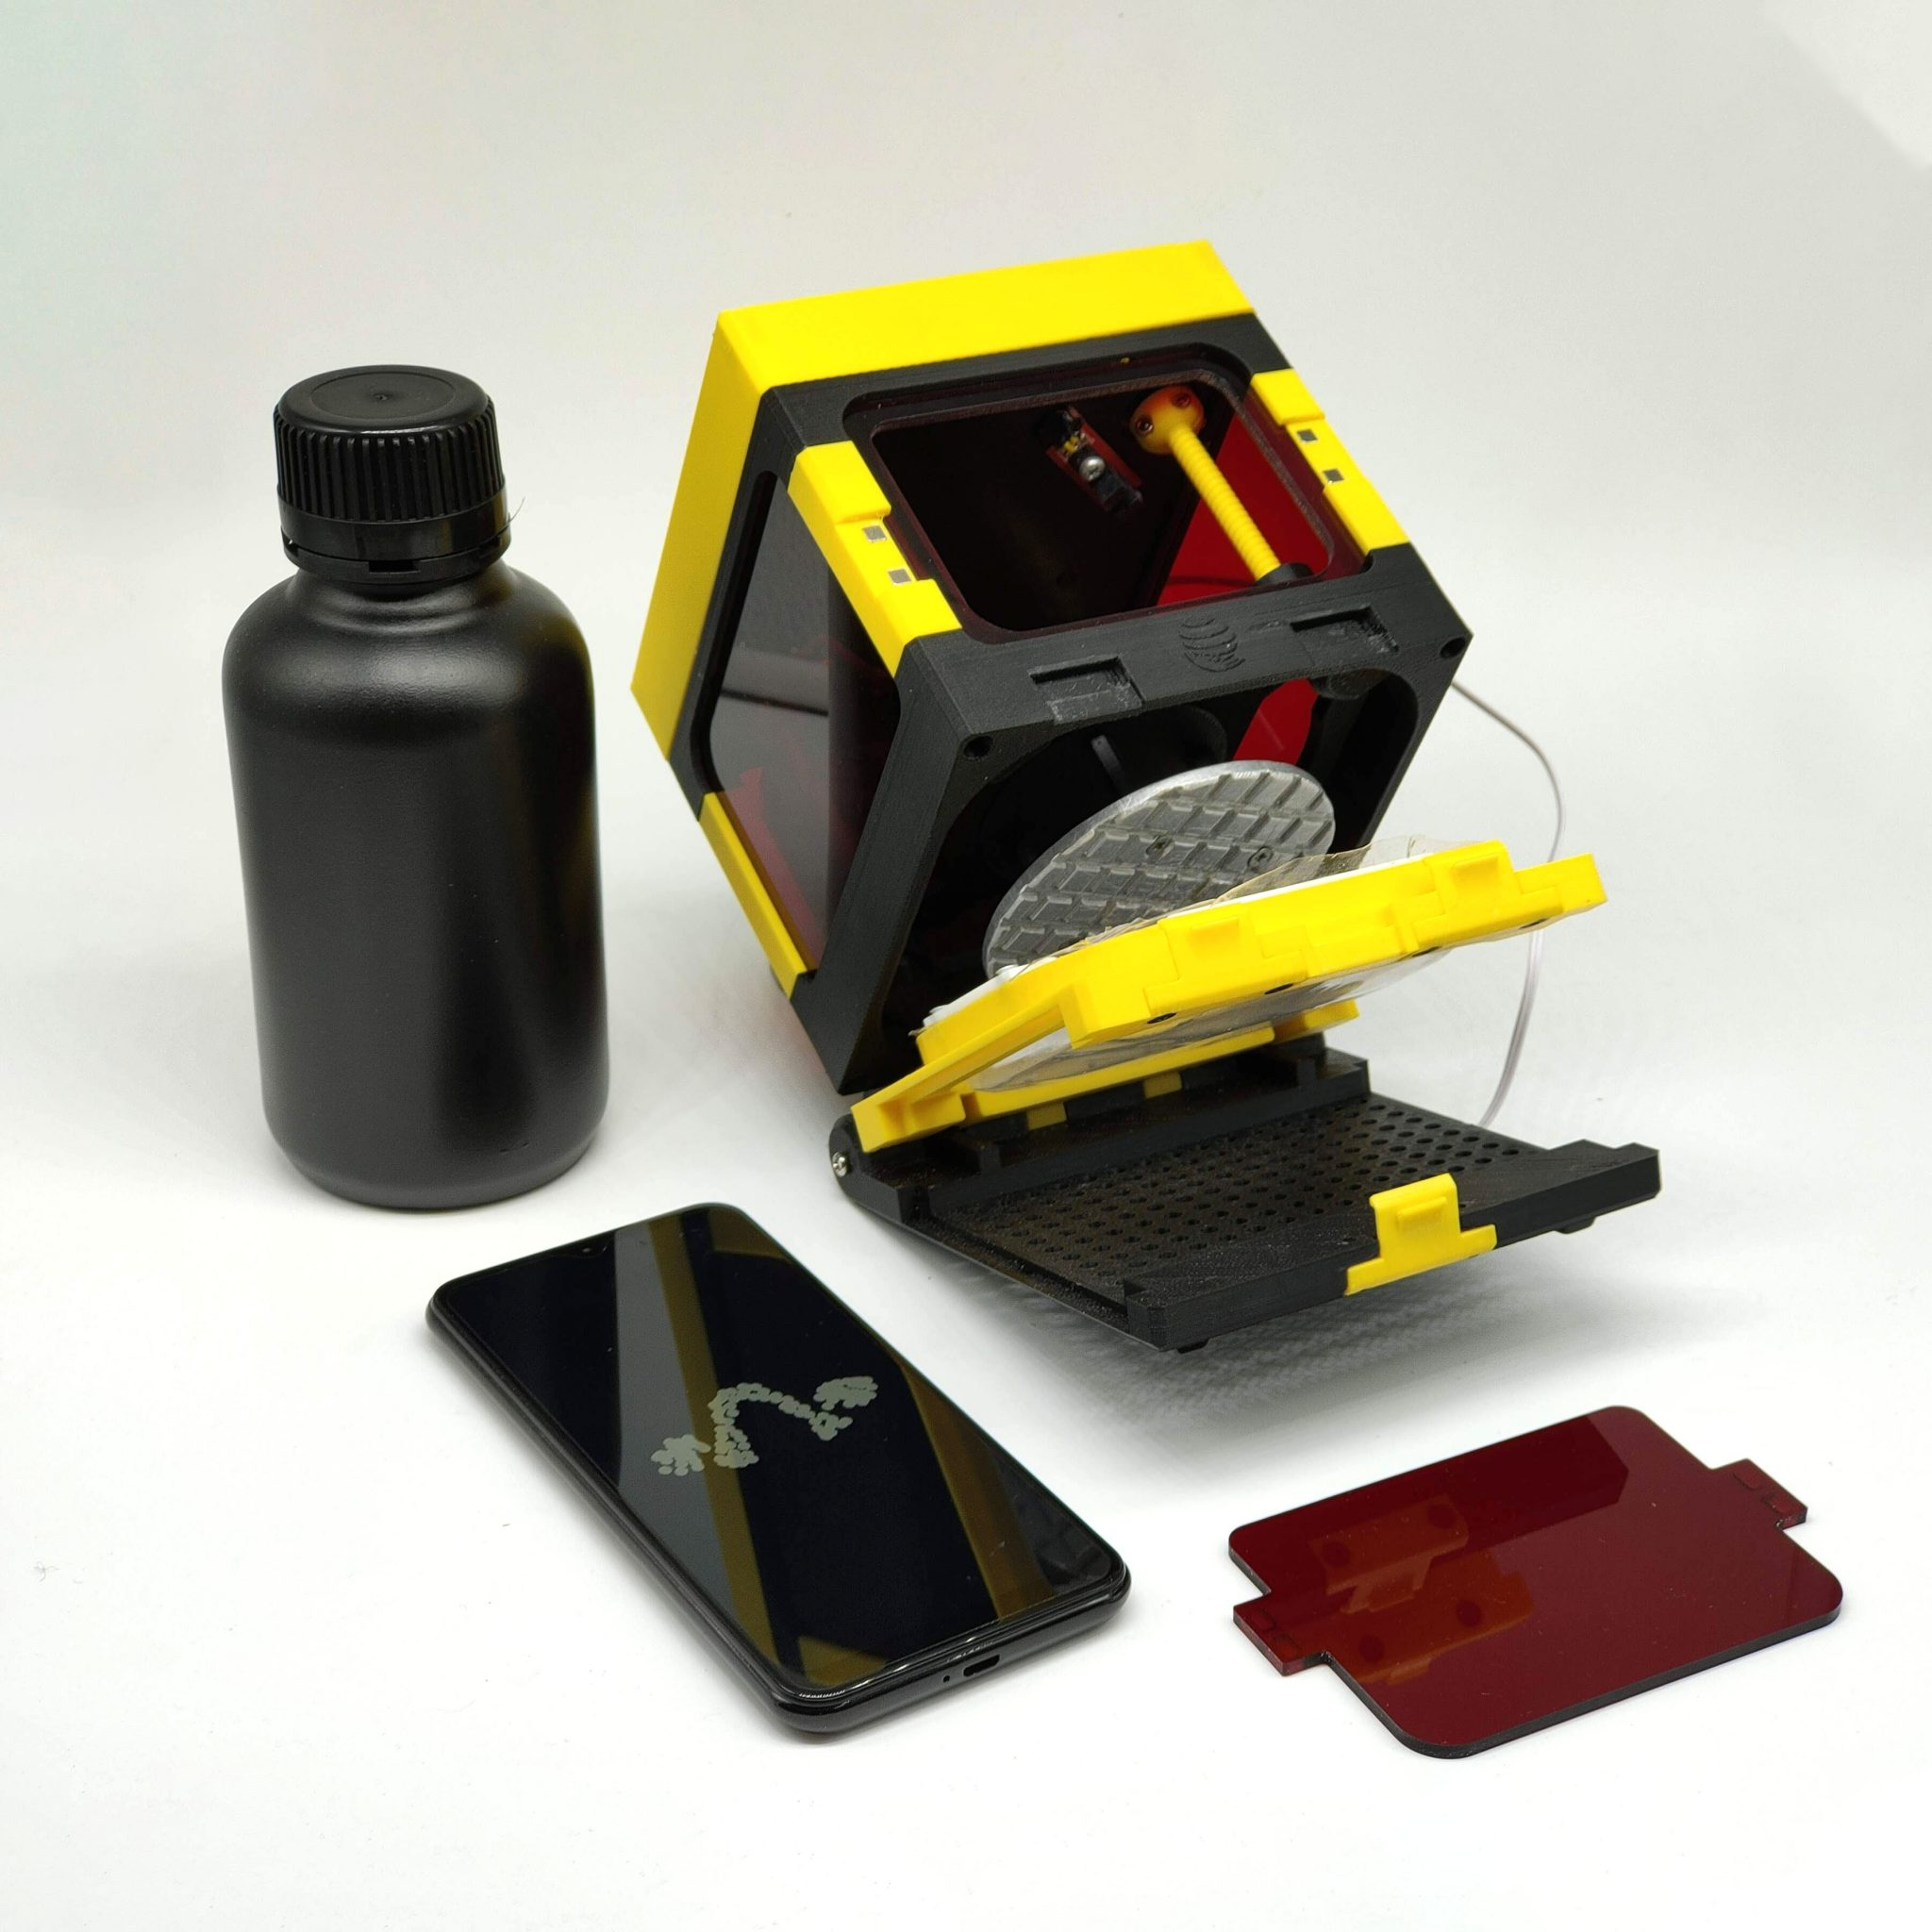 The LumiBee 3D printer. Photo via Lumi Industries.